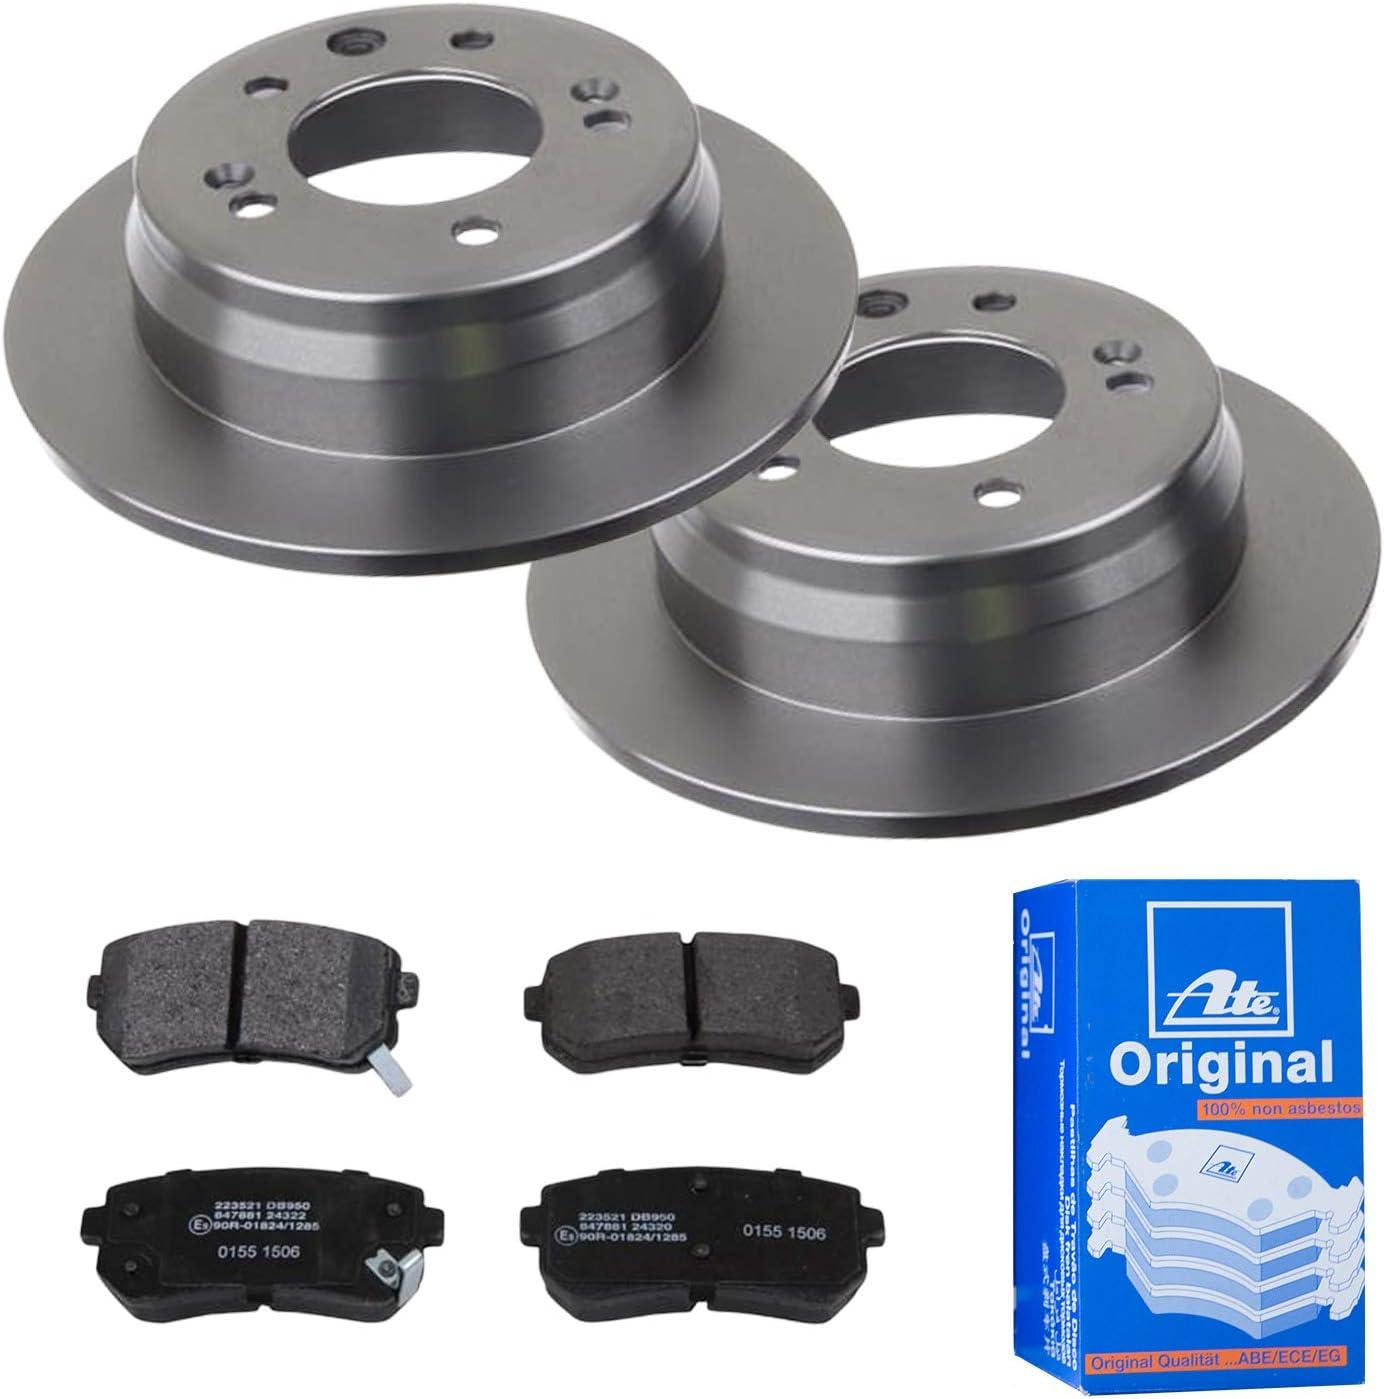 Ate 2 Brake Discs Diameter 262 Full Brake Pads For Hyundai I30 Fd Ix35 Auto